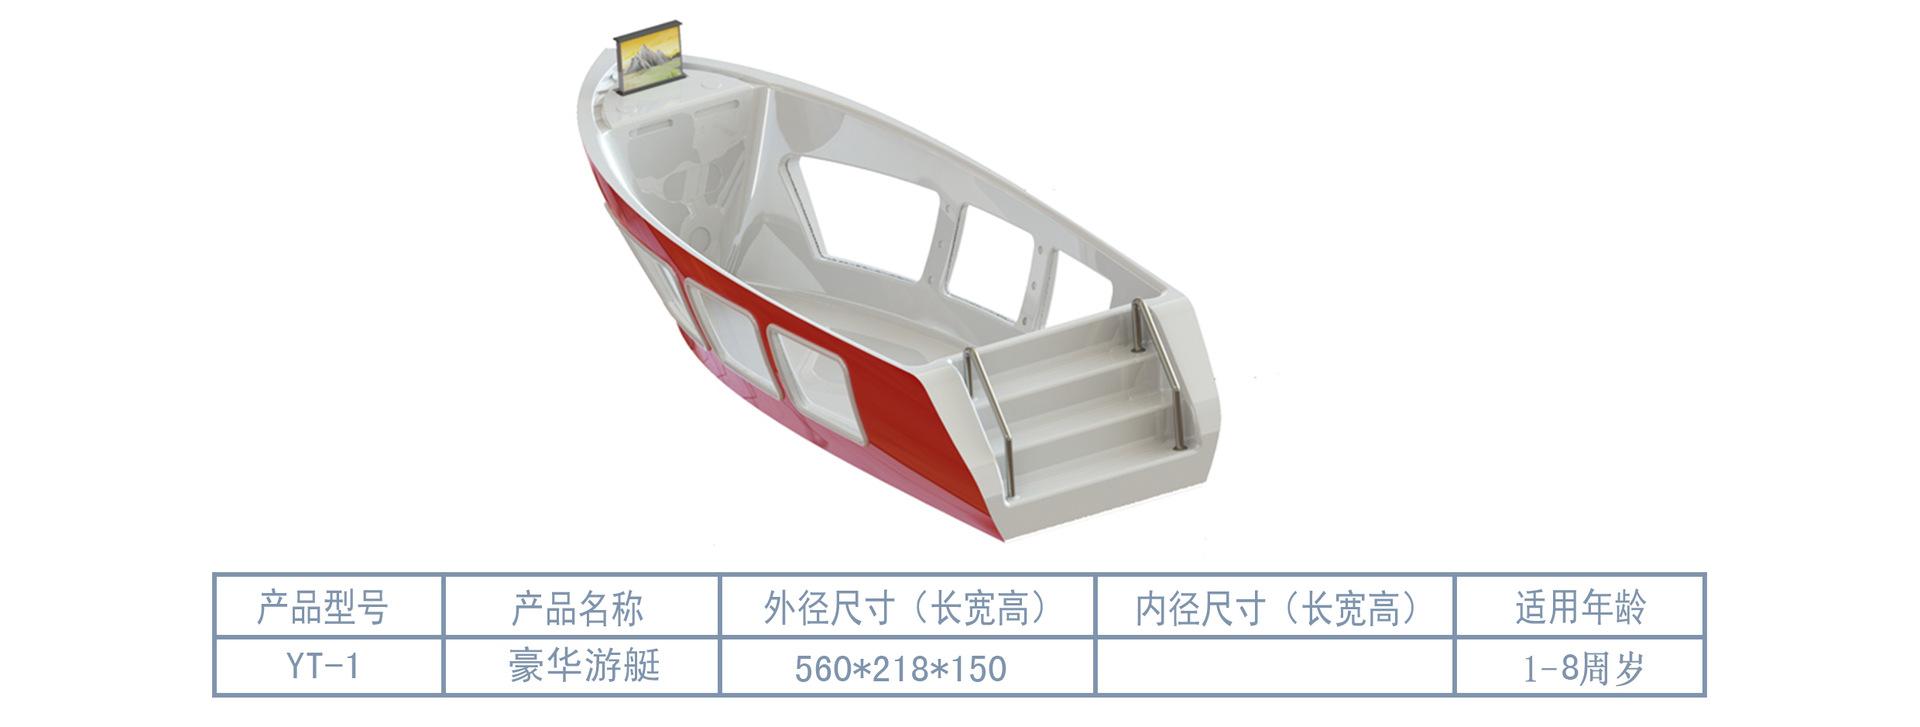 YT-1豪华游艇